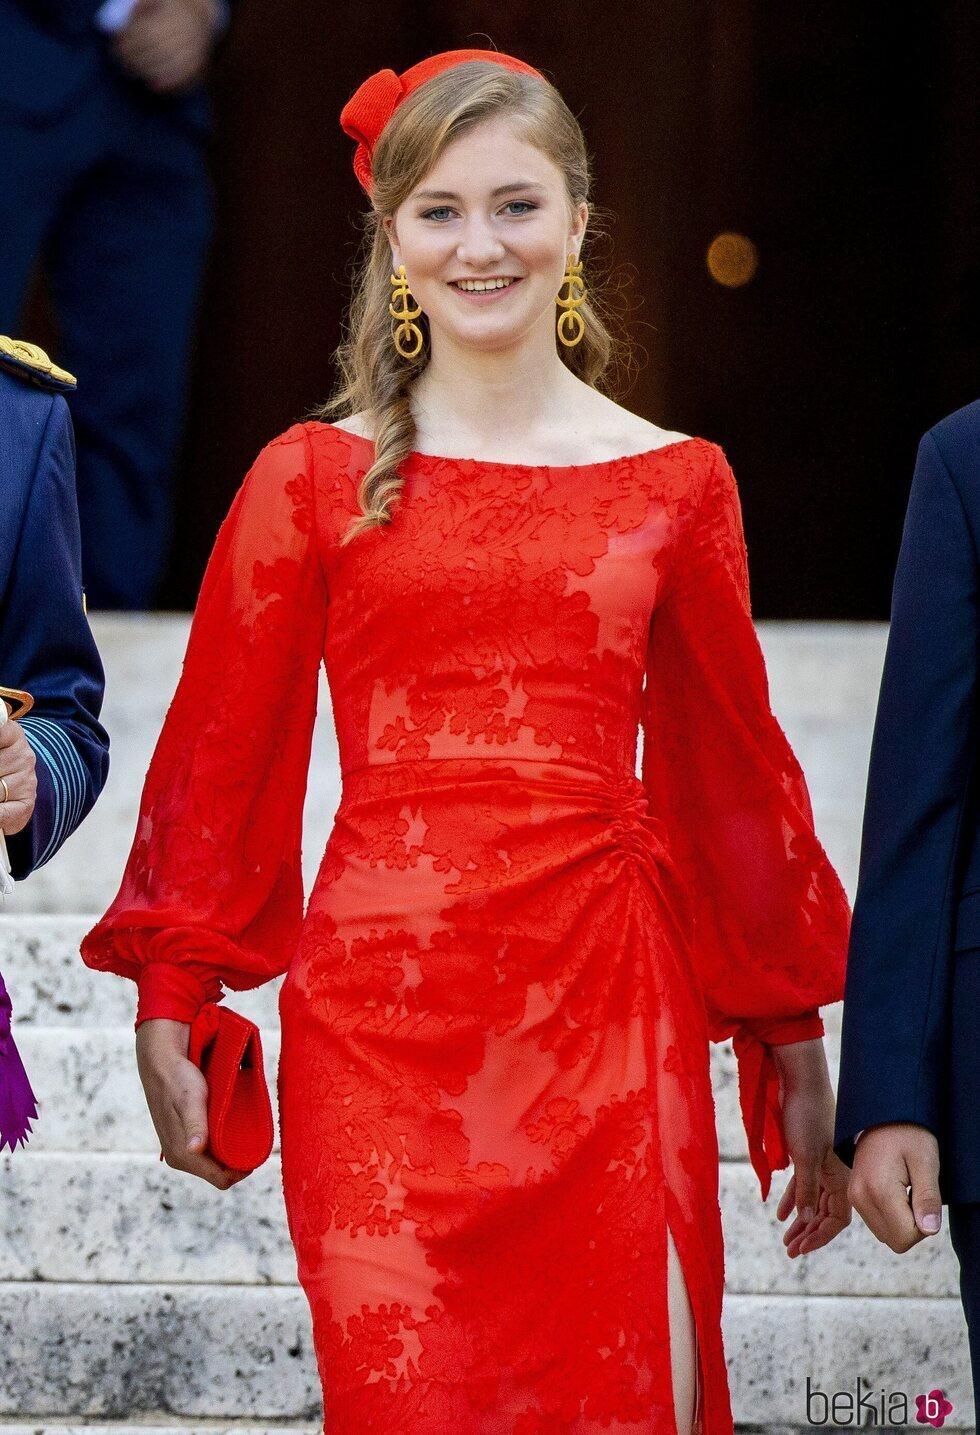 Isabel de Bélgica en el Día Nacional de Bélgica 2021